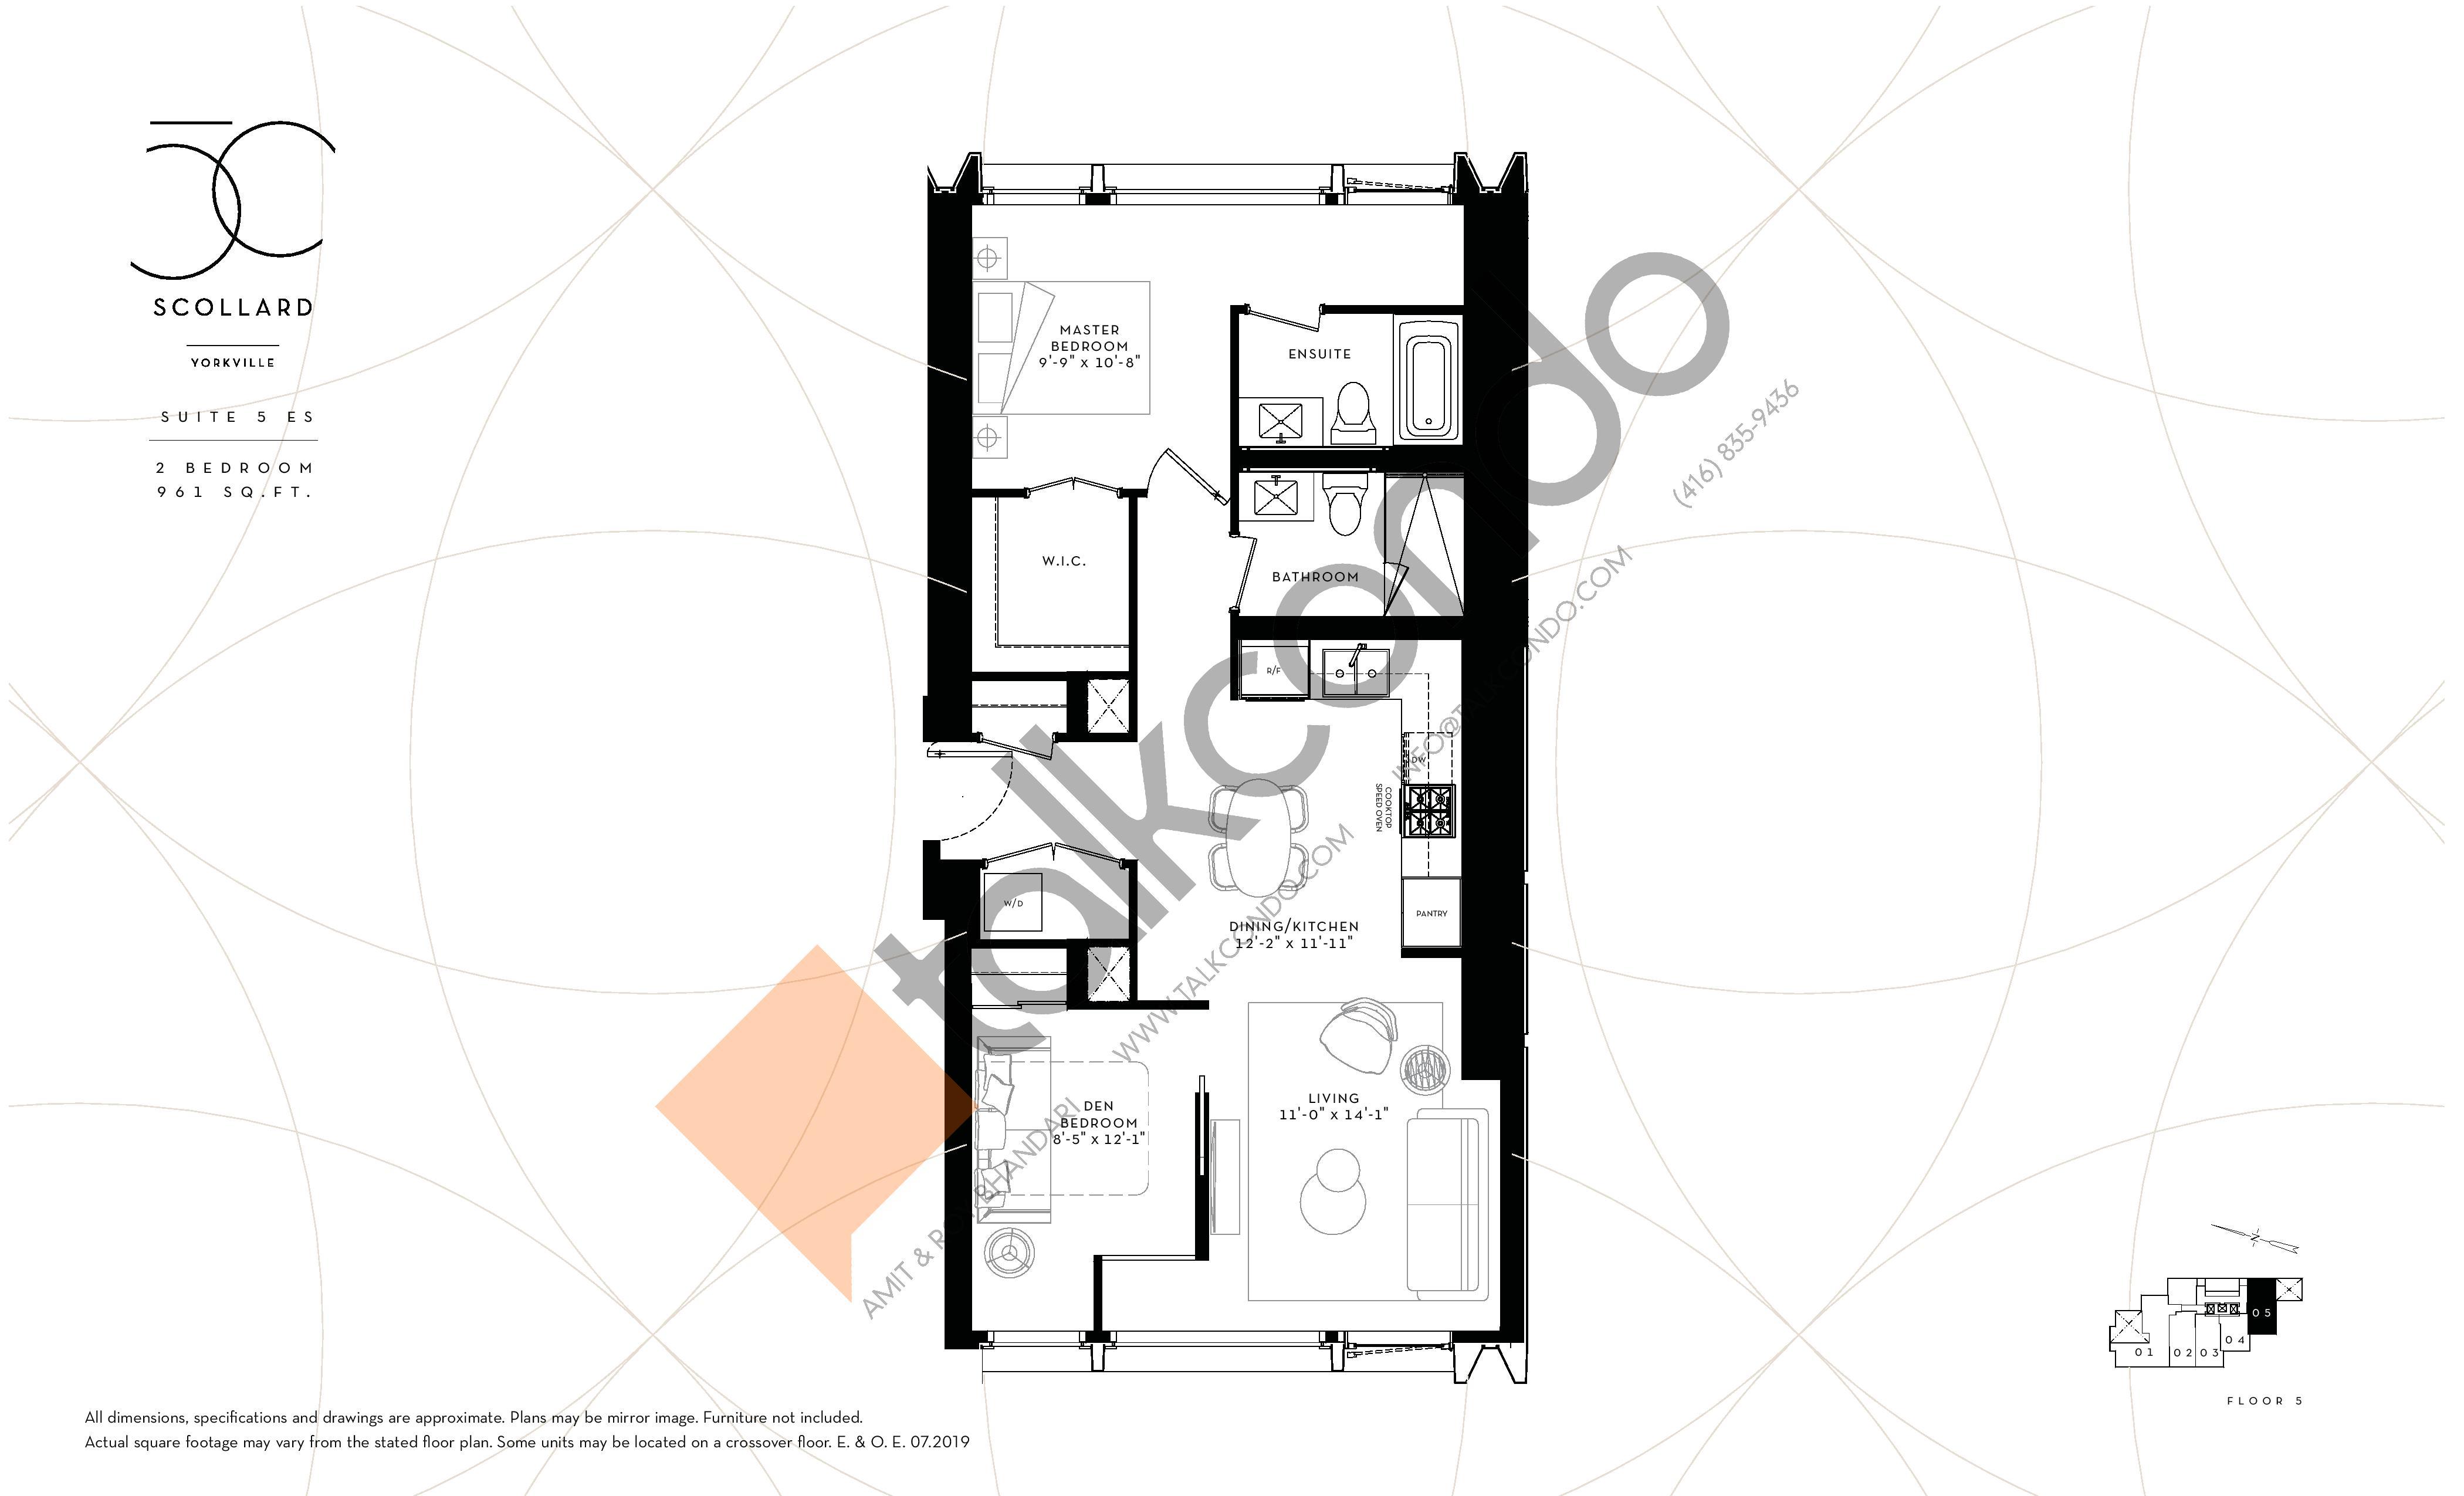 Suite 5 ES Floor Plan at Fifty Scollard Condos - 961 sq.ft